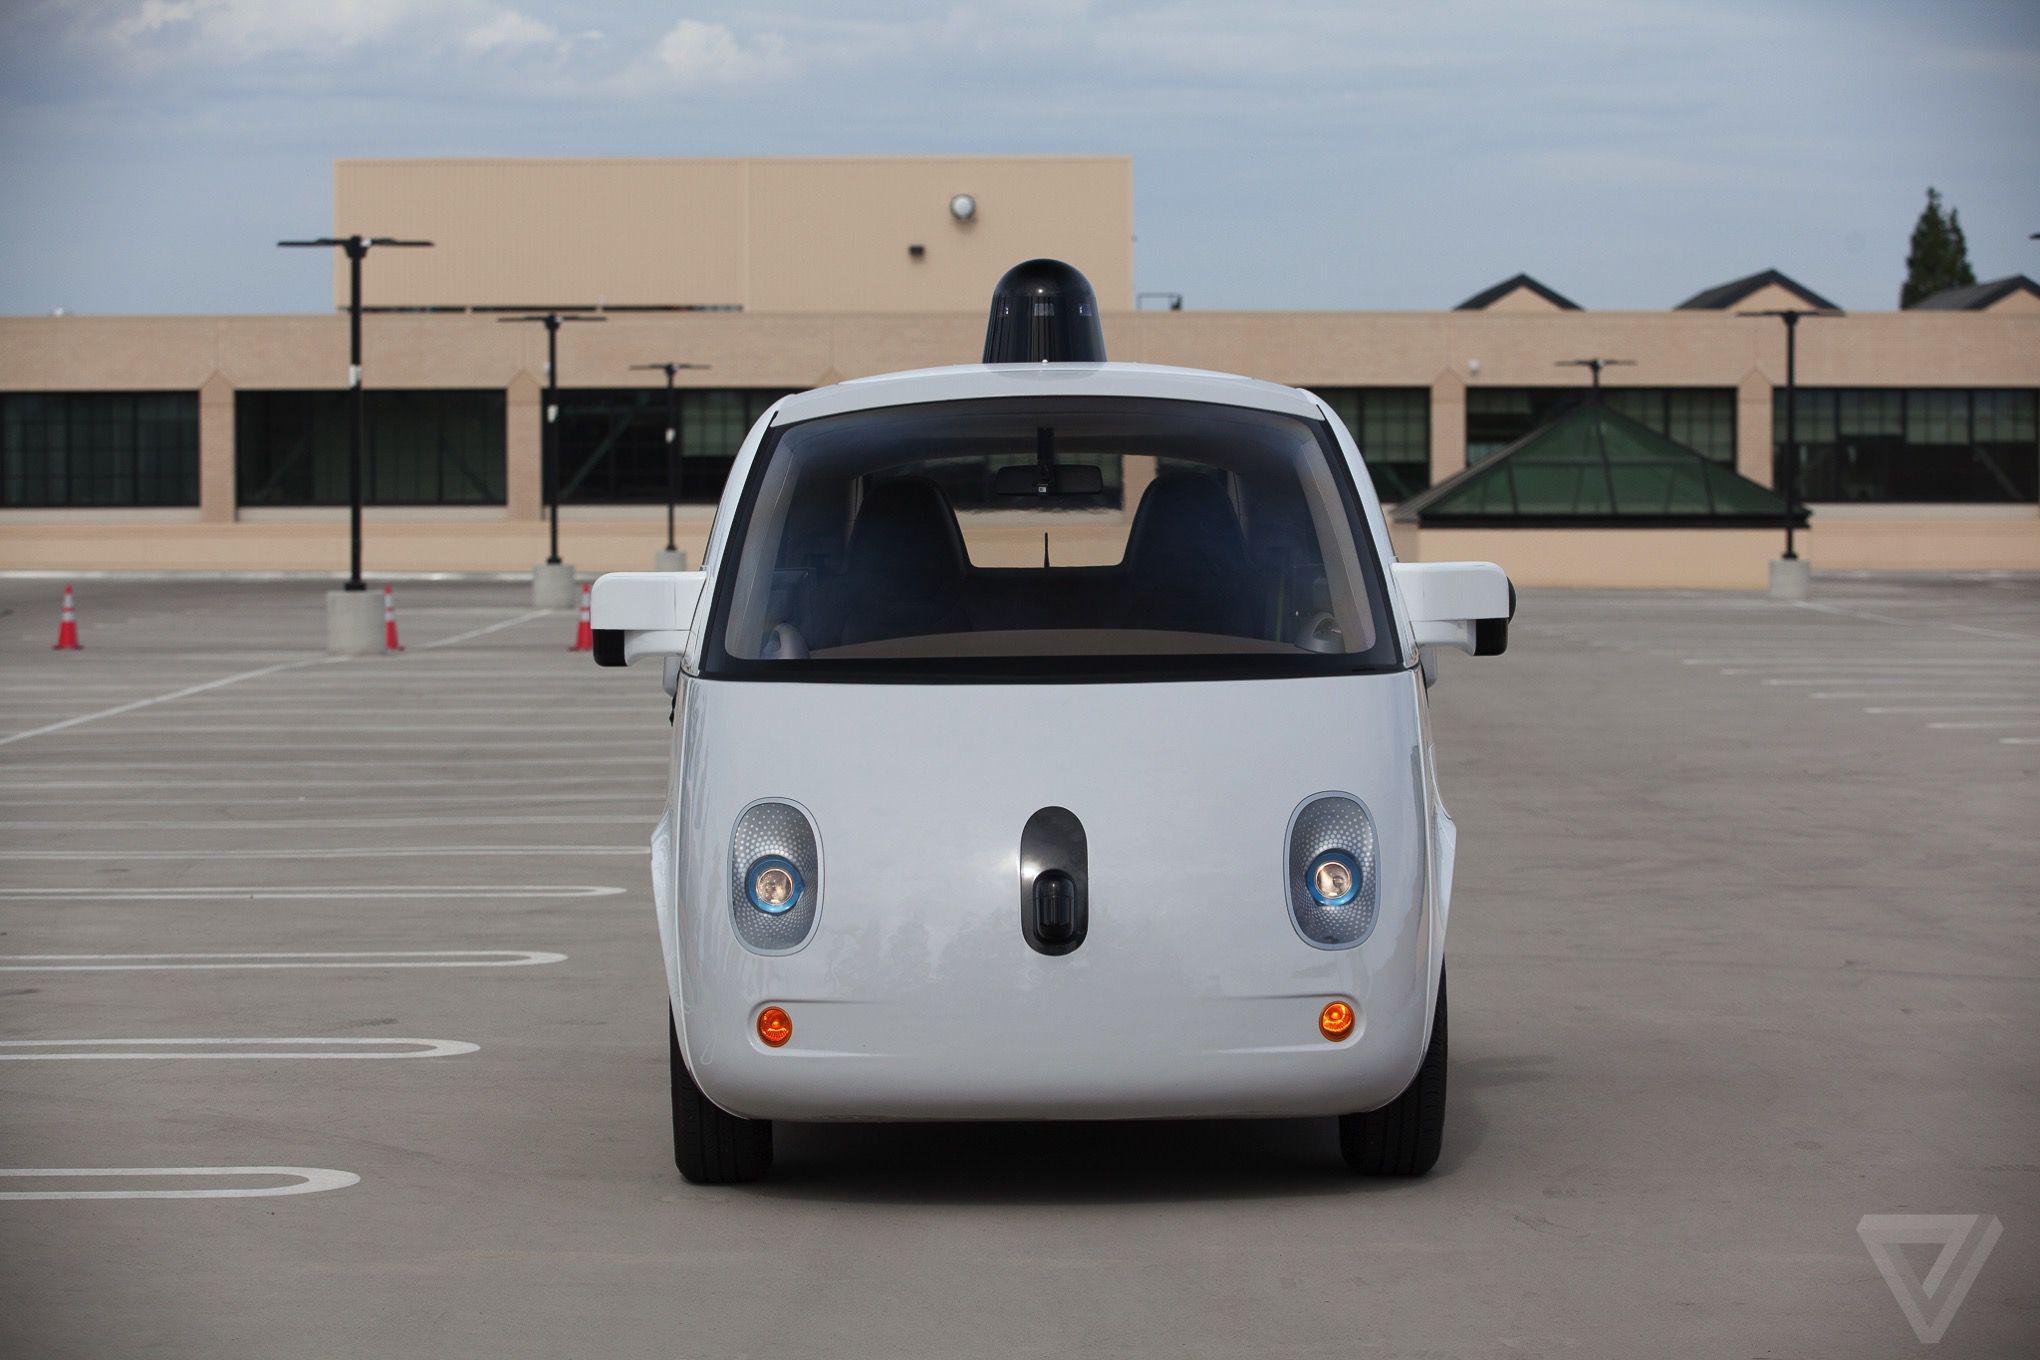 Google's self-driving car prototype